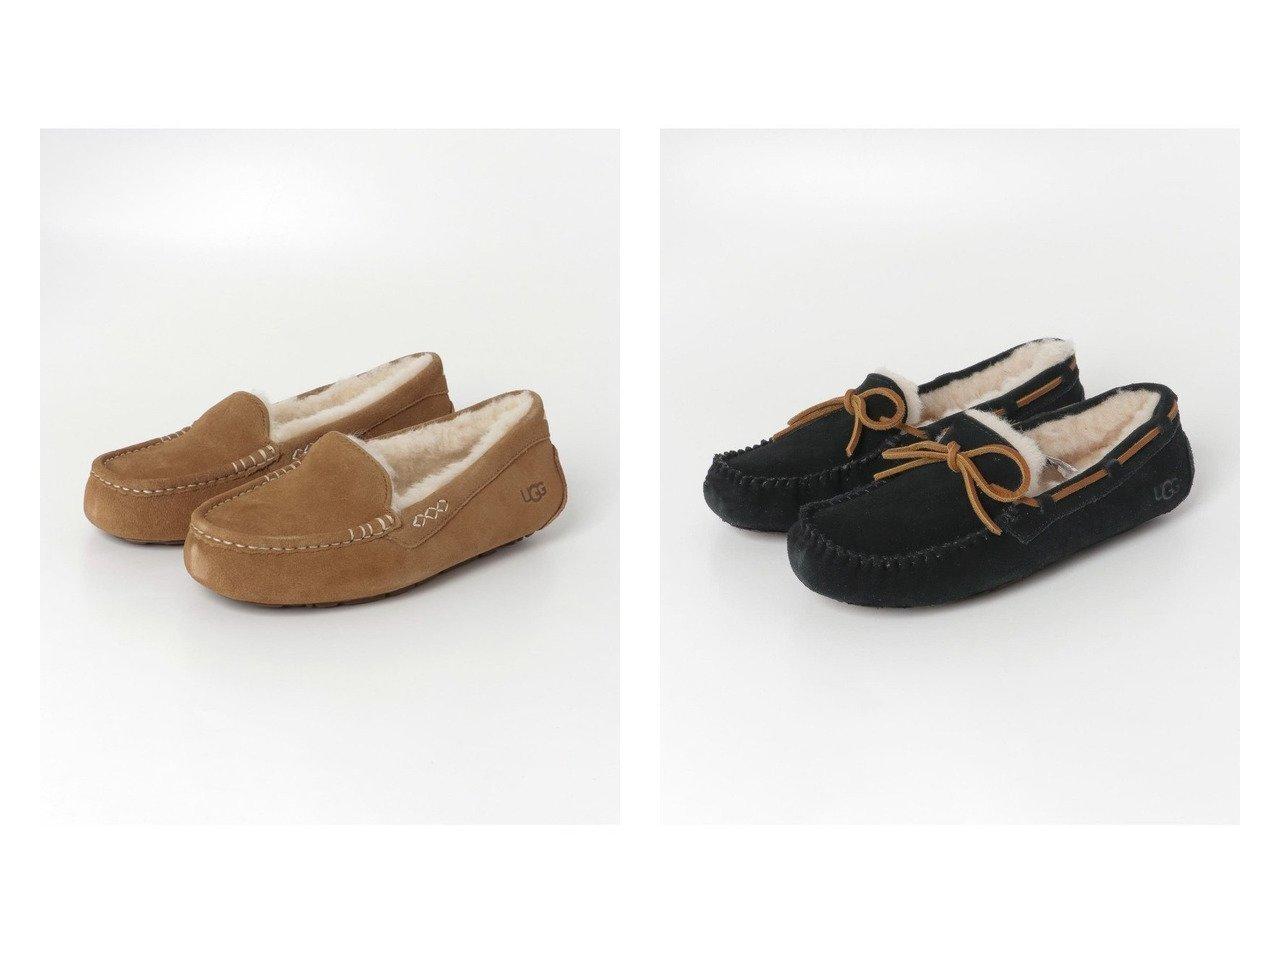 【Sonny Label / URBAN RESEARCH/サニーレーベル】のUGG ANSLEY&UGG DAKOTA シューズ・靴のおすすめ!人気、トレンド・レディースファッションの通販 おすすめで人気の流行・トレンド、ファッションの通販商品 メンズファッション・キッズファッション・インテリア・家具・レディースファッション・服の通販 founy(ファニー) https://founy.com/ ファッション Fashion レディースファッション WOMEN インソール シューズ スエード スリッポン モダン 人気 定番 シンプル ライニング リボン 軽量 |ID:crp329100000009795